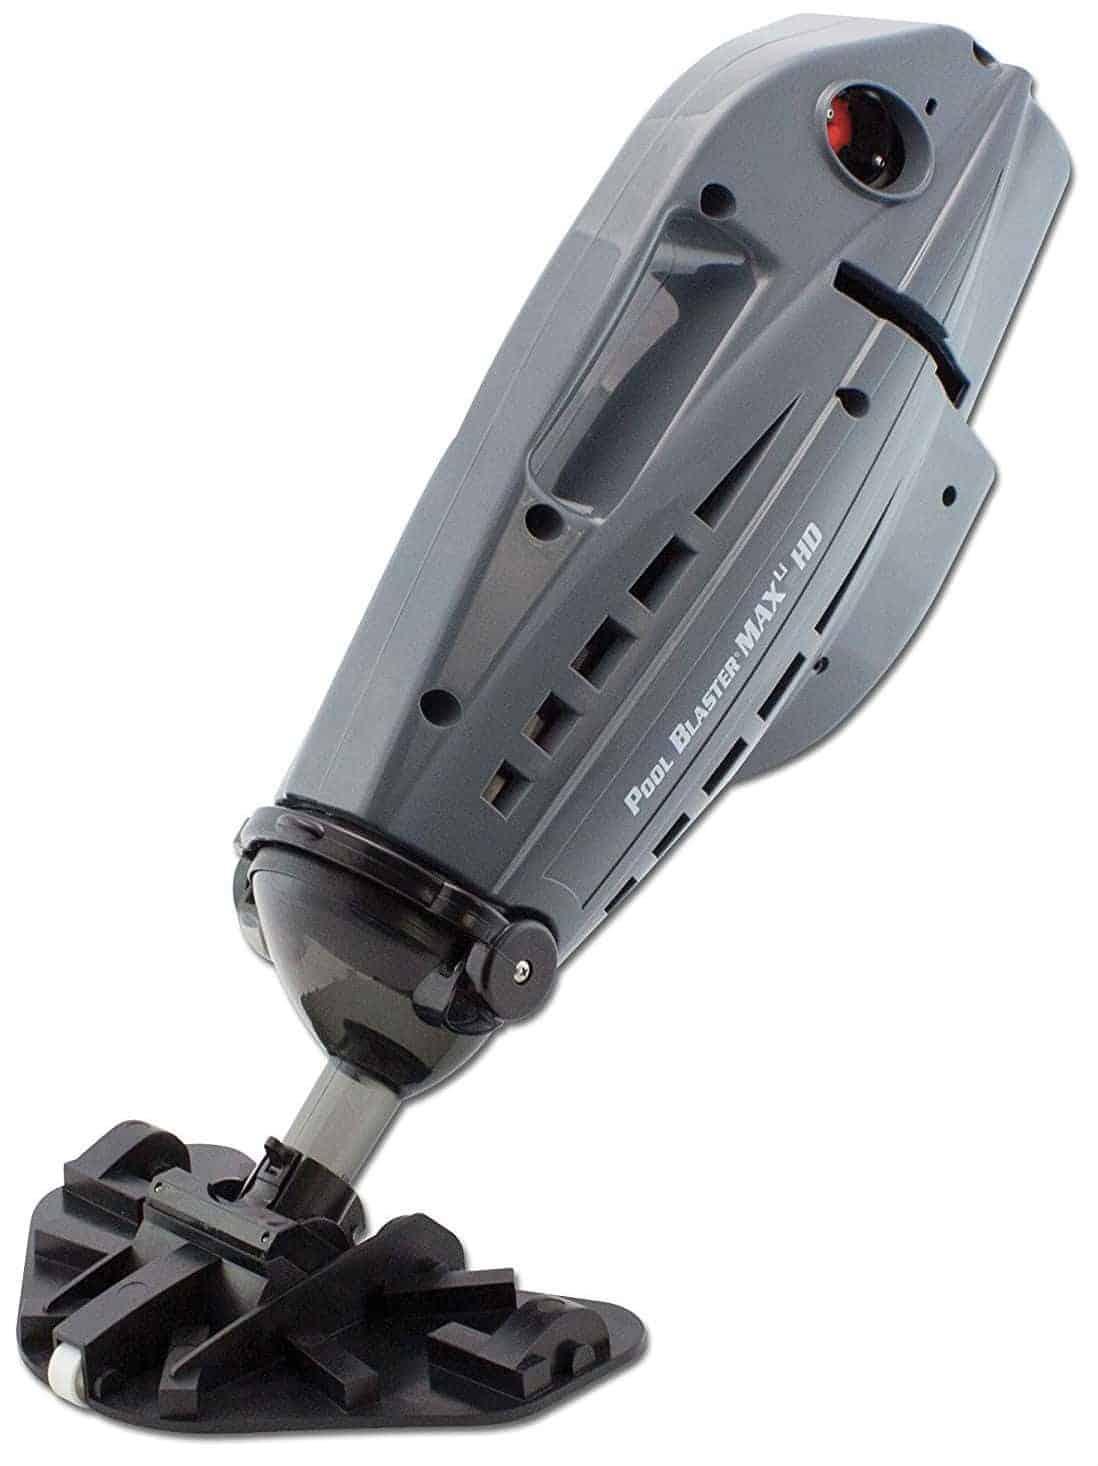 Water Tech Pool Blaster Max Li HD Manual Handheld Cordless Pool and Spa Vacuum Cleaner